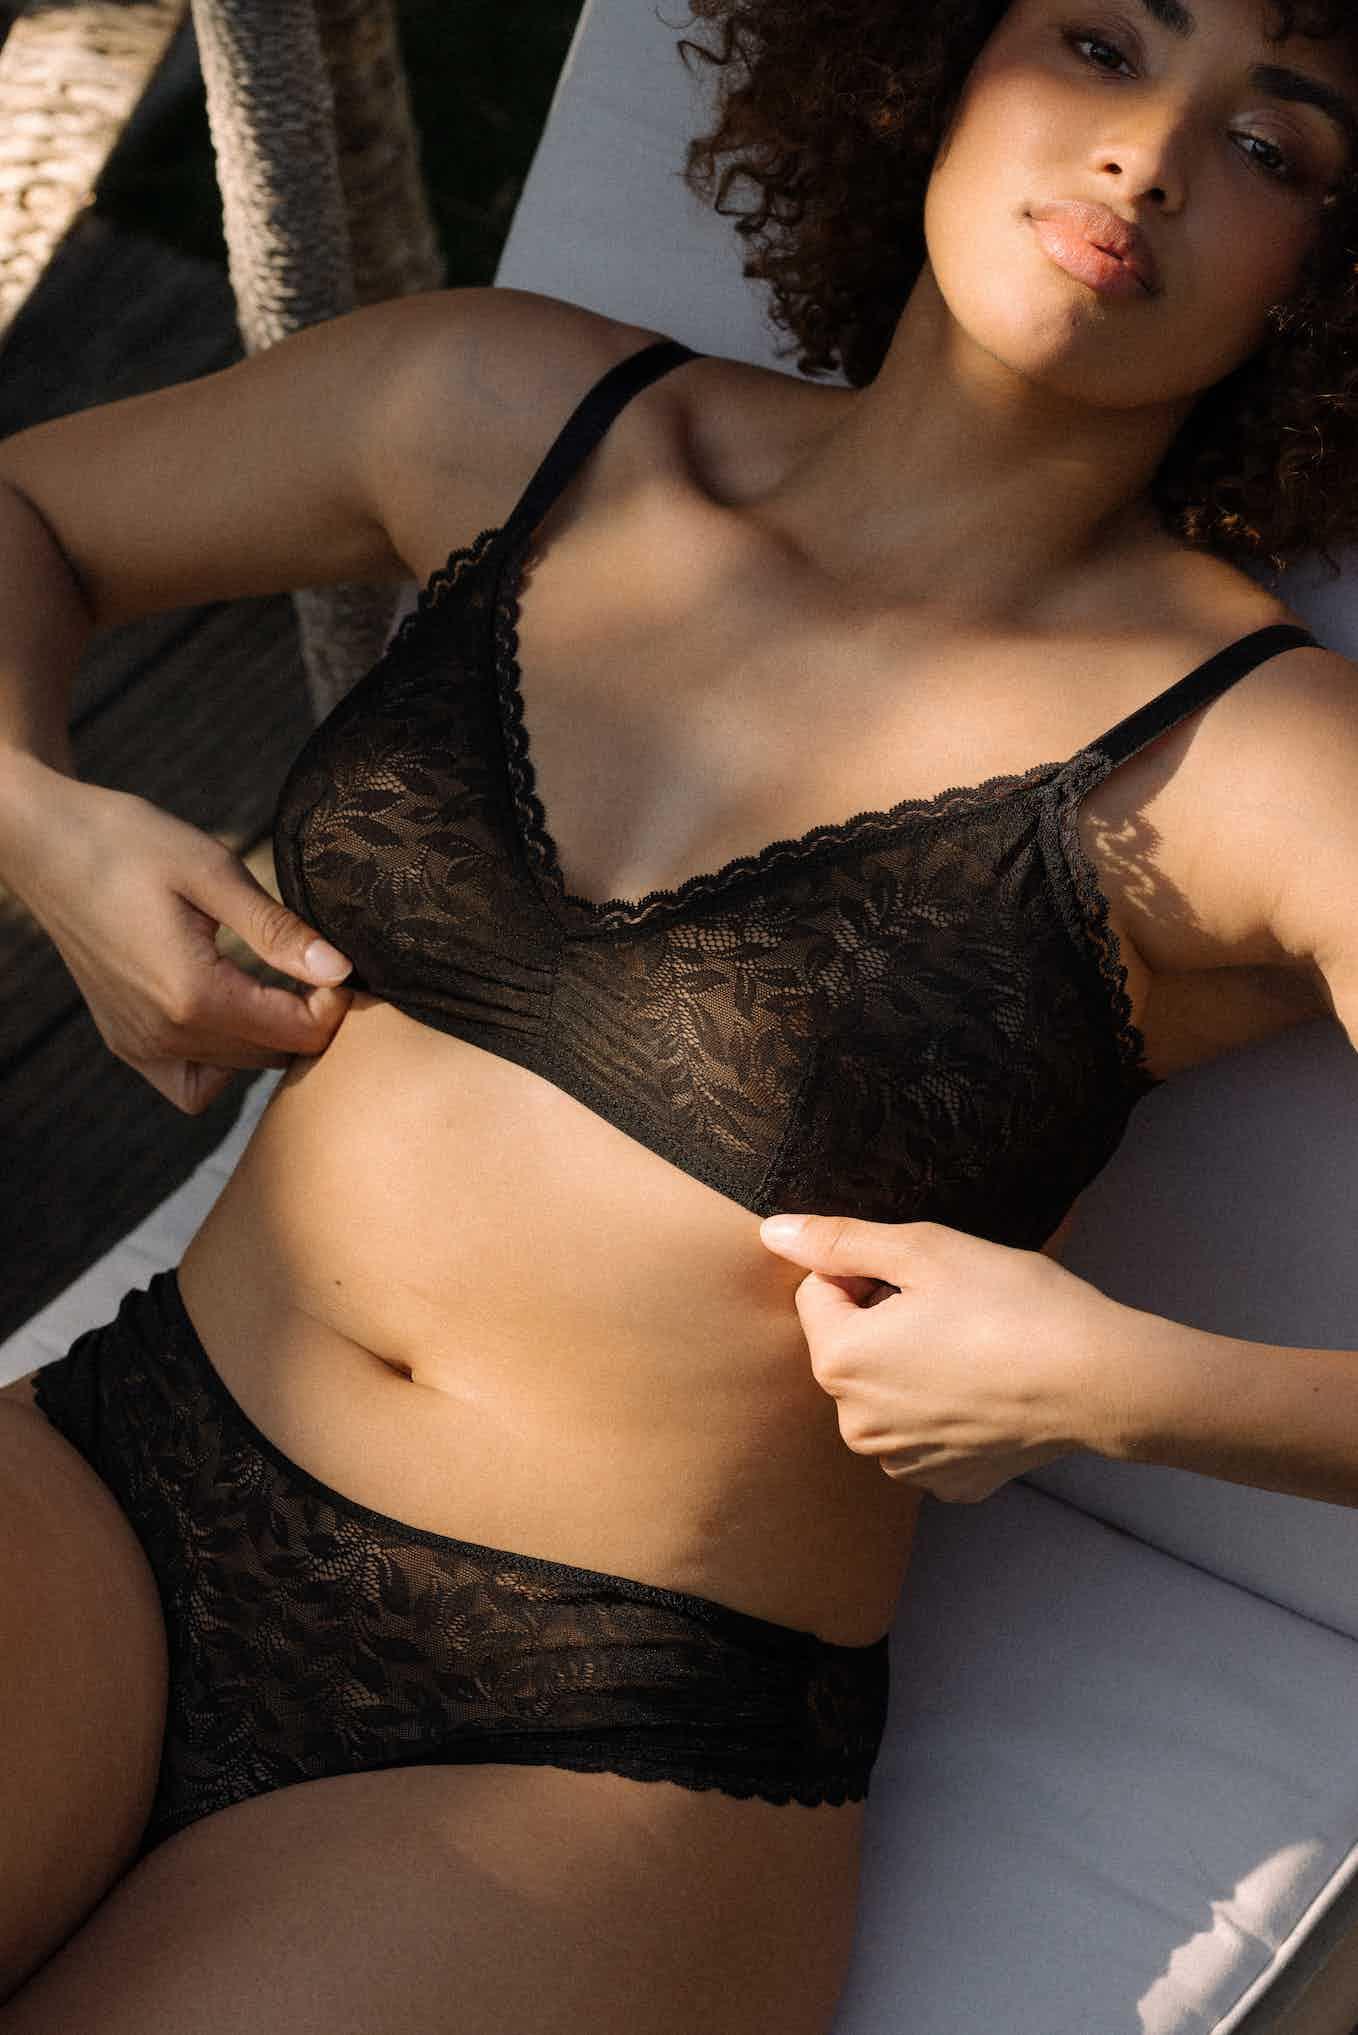 Lingerie set Les flots du coeur in black worn by Alizée